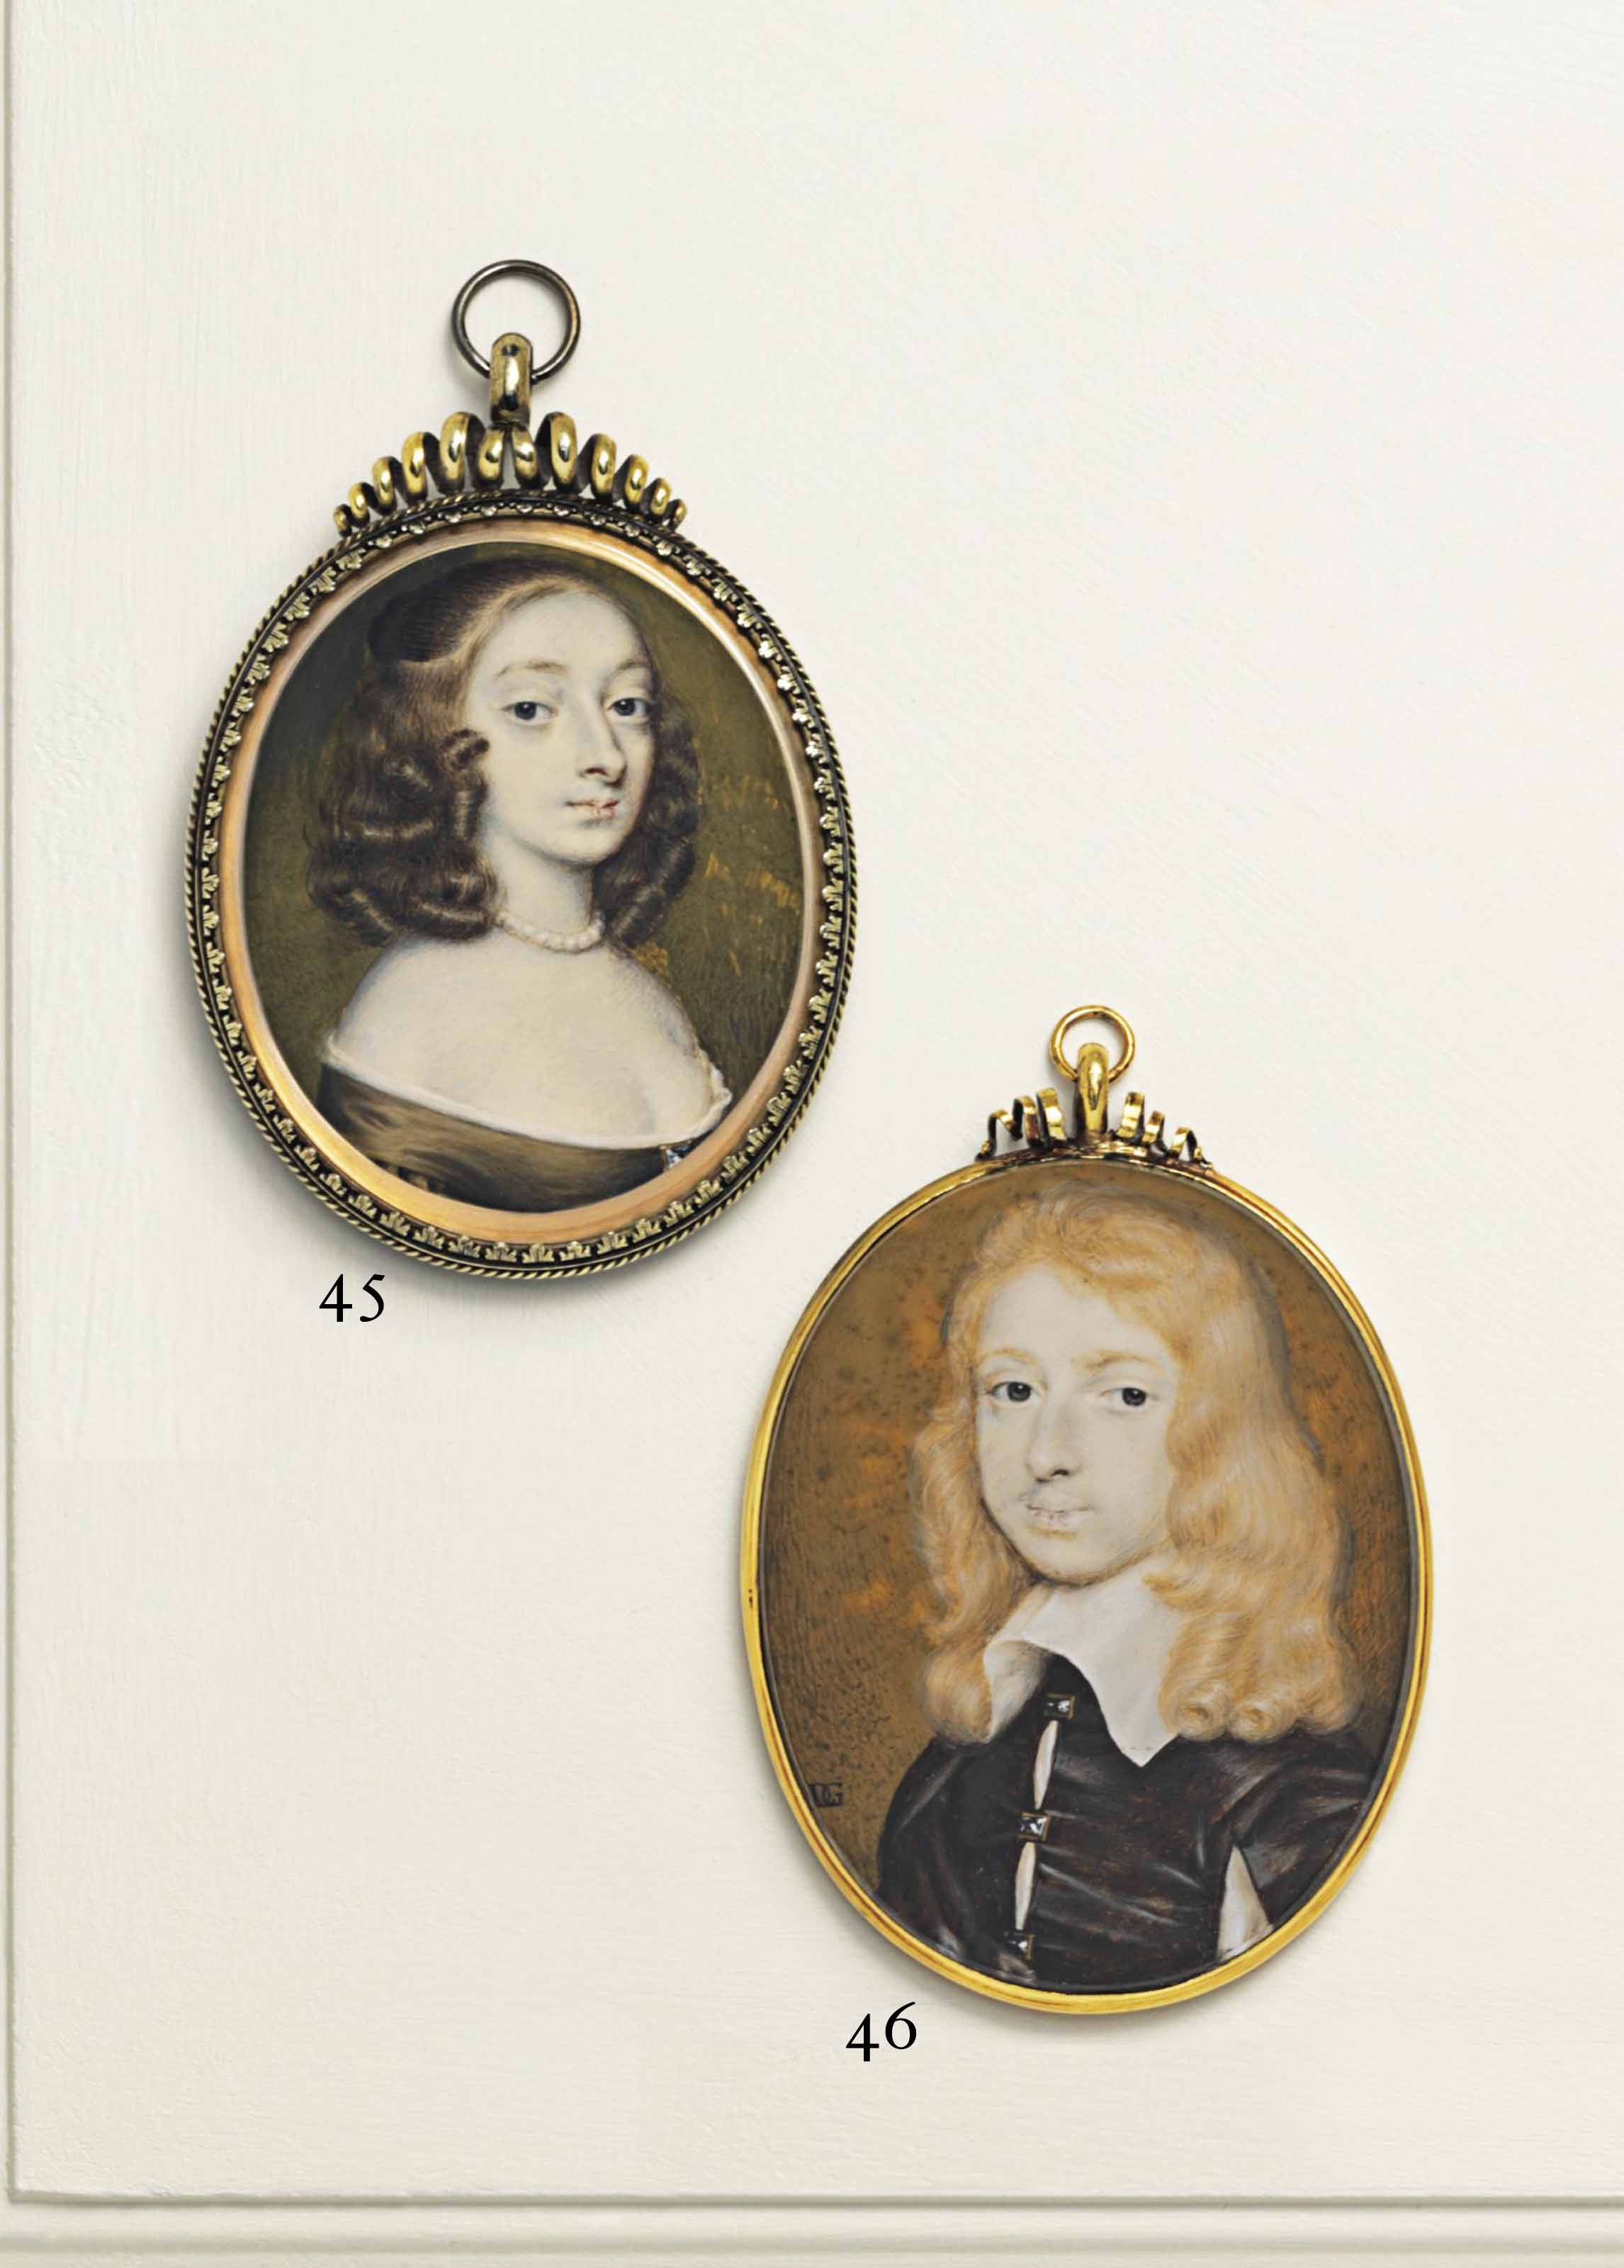 RICHARD GIBSON (BRITISH, 1615-1690)